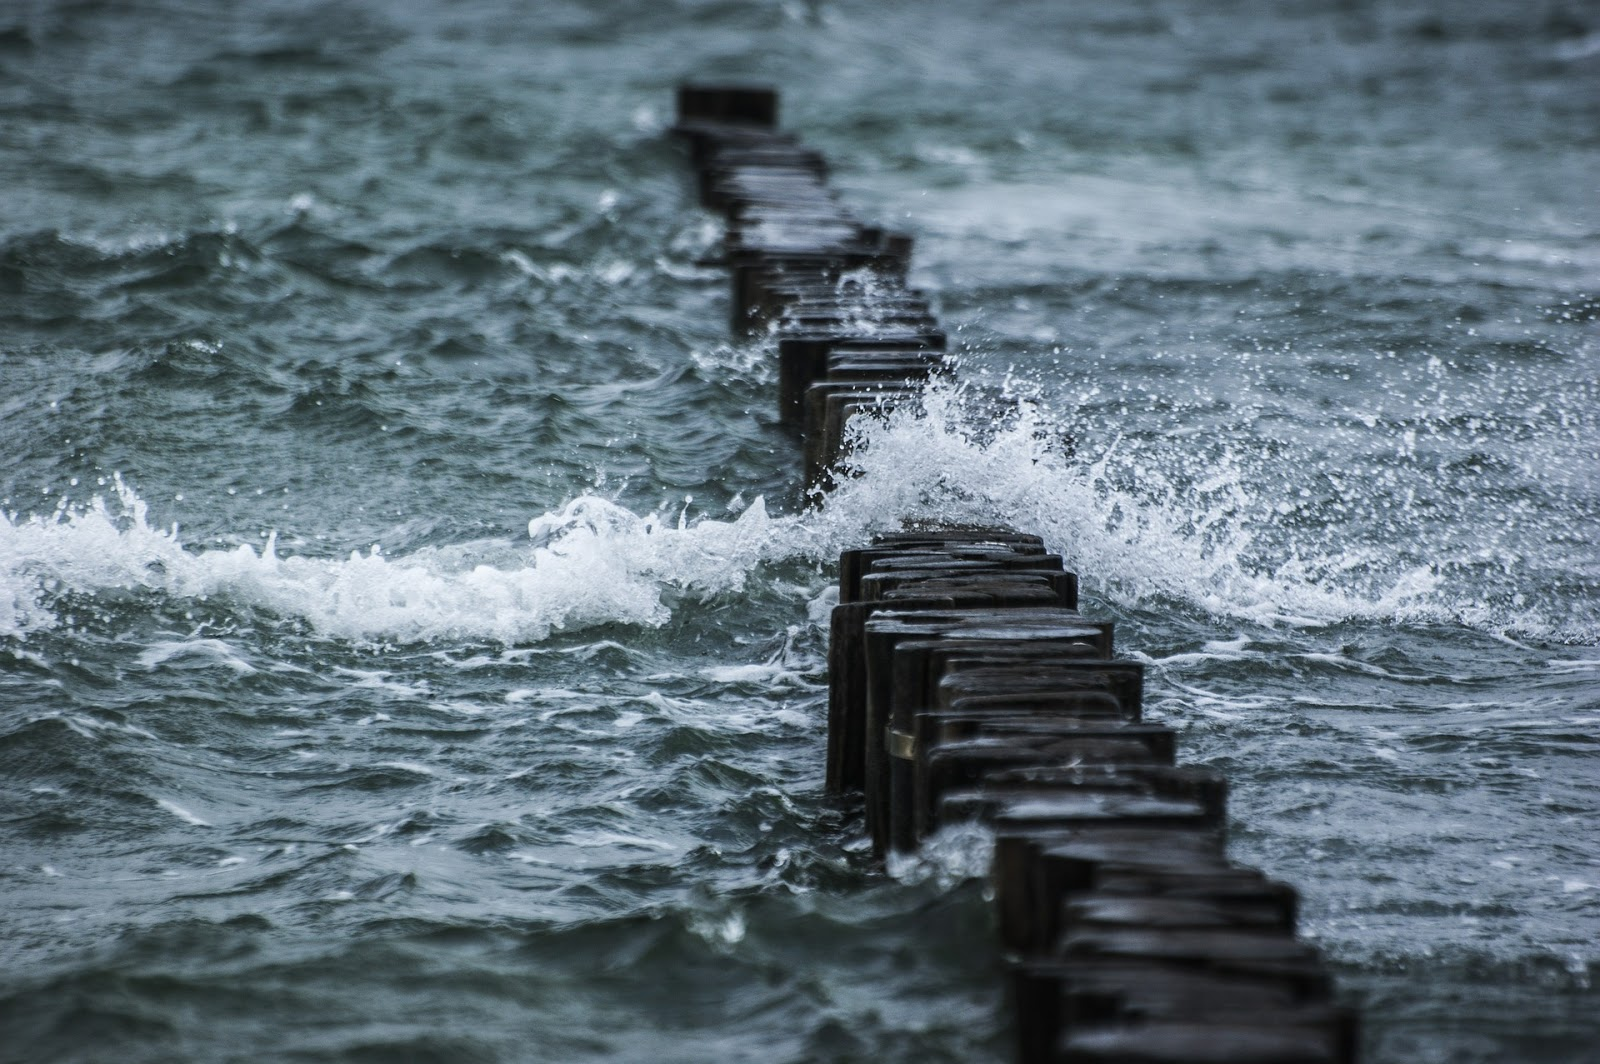 Piękno na fali - Gdynia 27 lipca 2019 cz.2